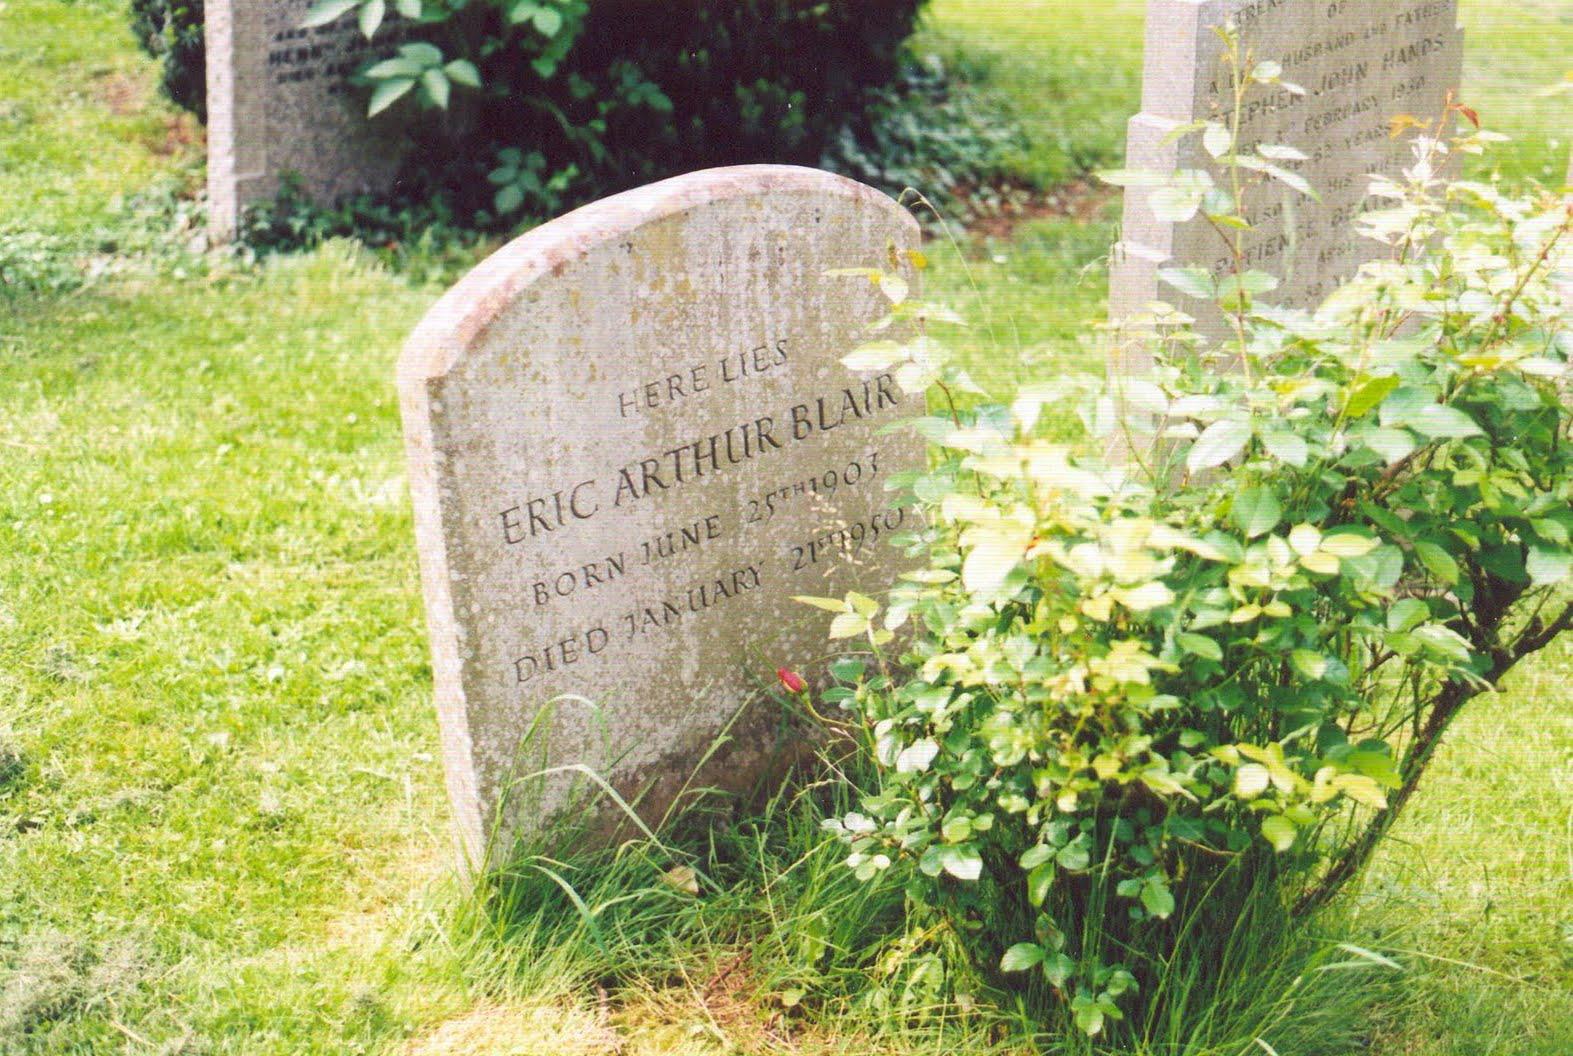 george orwell grave